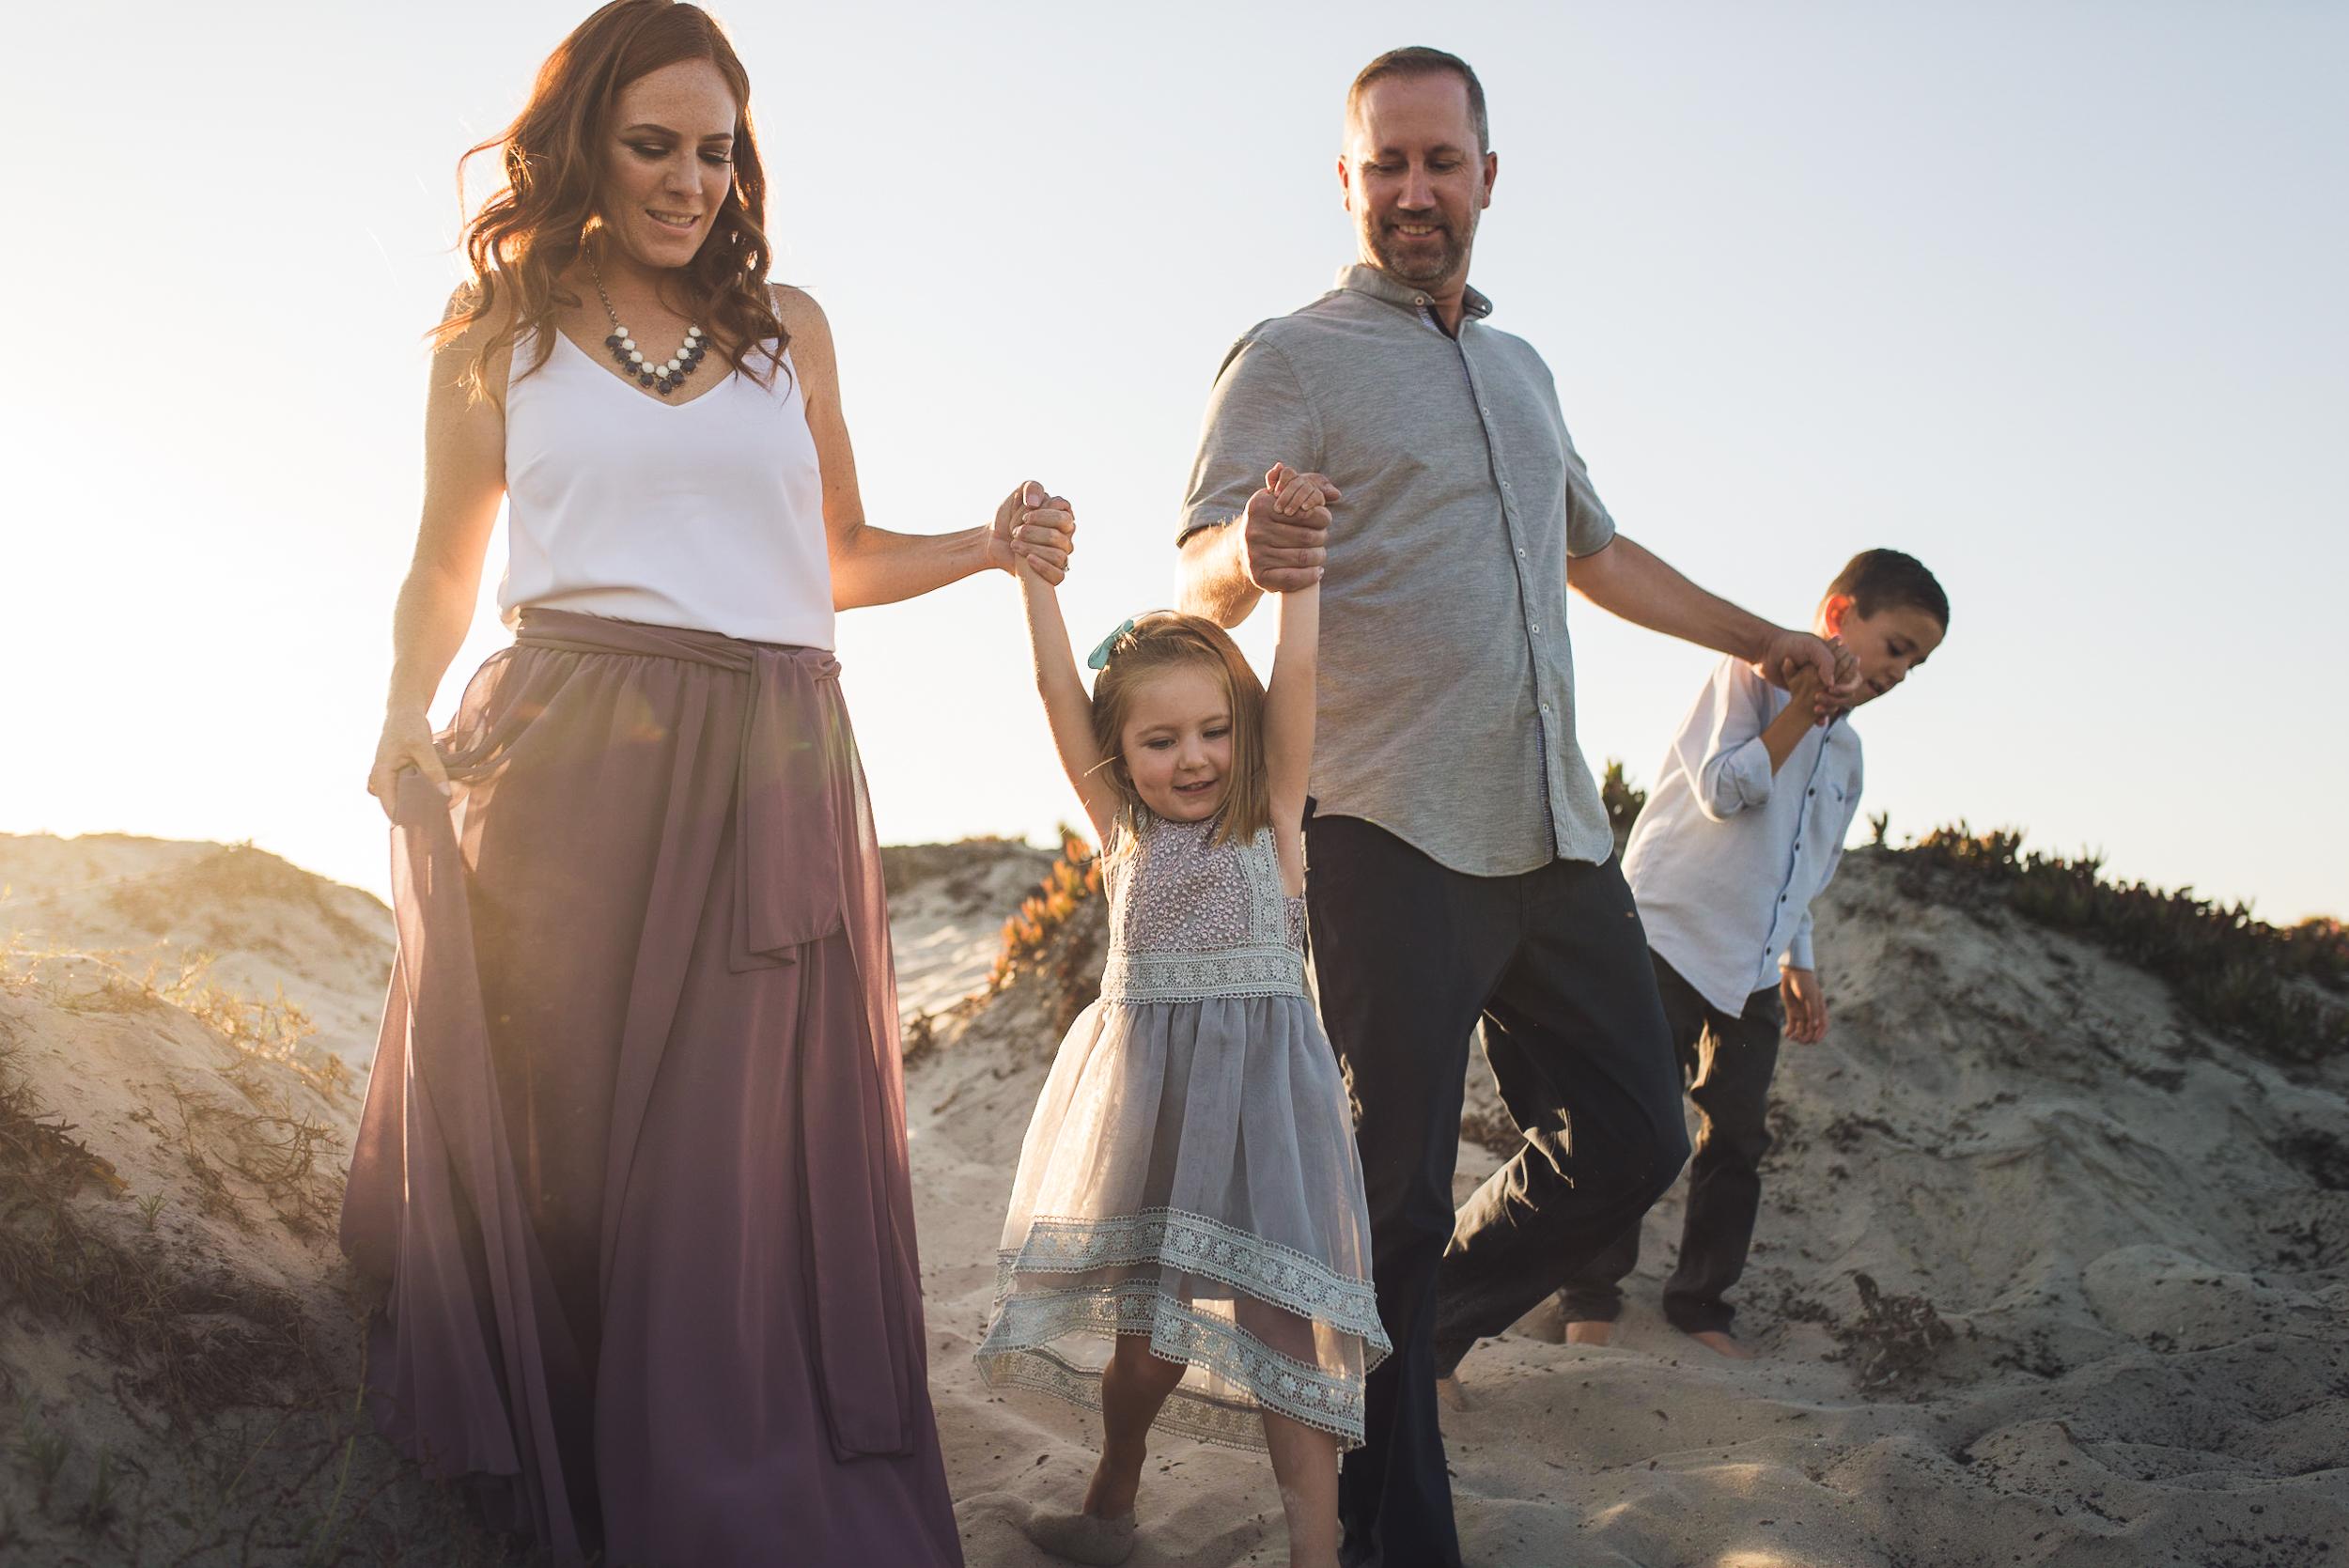 2018-San-Diego-Family-Lifestyle-Newborn-Travel-Vacation-Photographer-Kelsey-Smith-Photography-Coronado-La-Jolla-Encinitas-Solana-Beach-Del-Mar-186.jpg